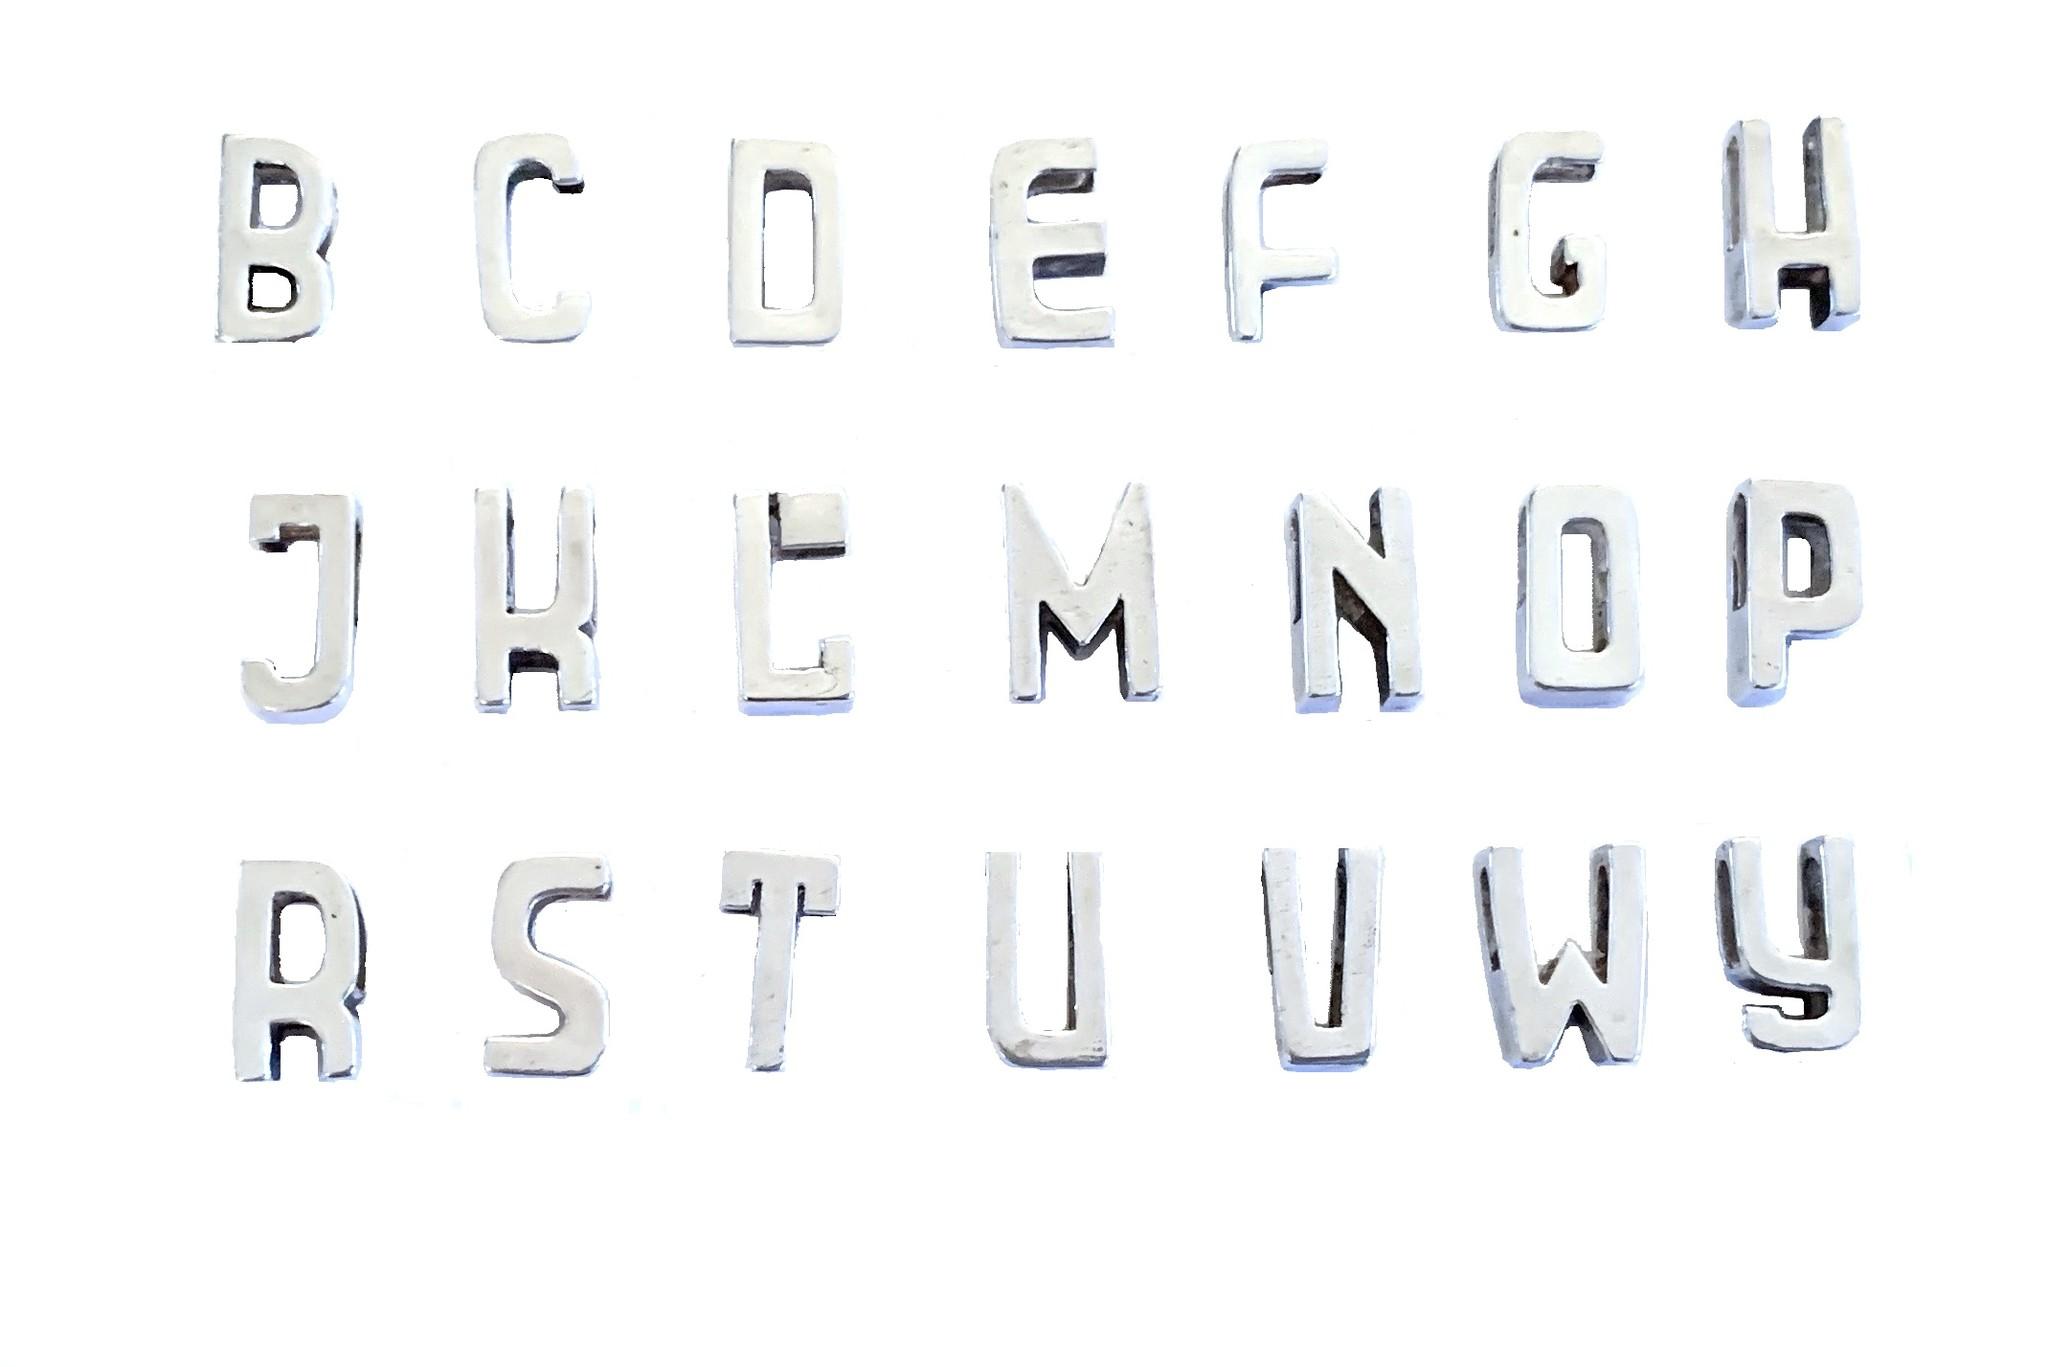 Cadeau idee Ketting met letter, zilver